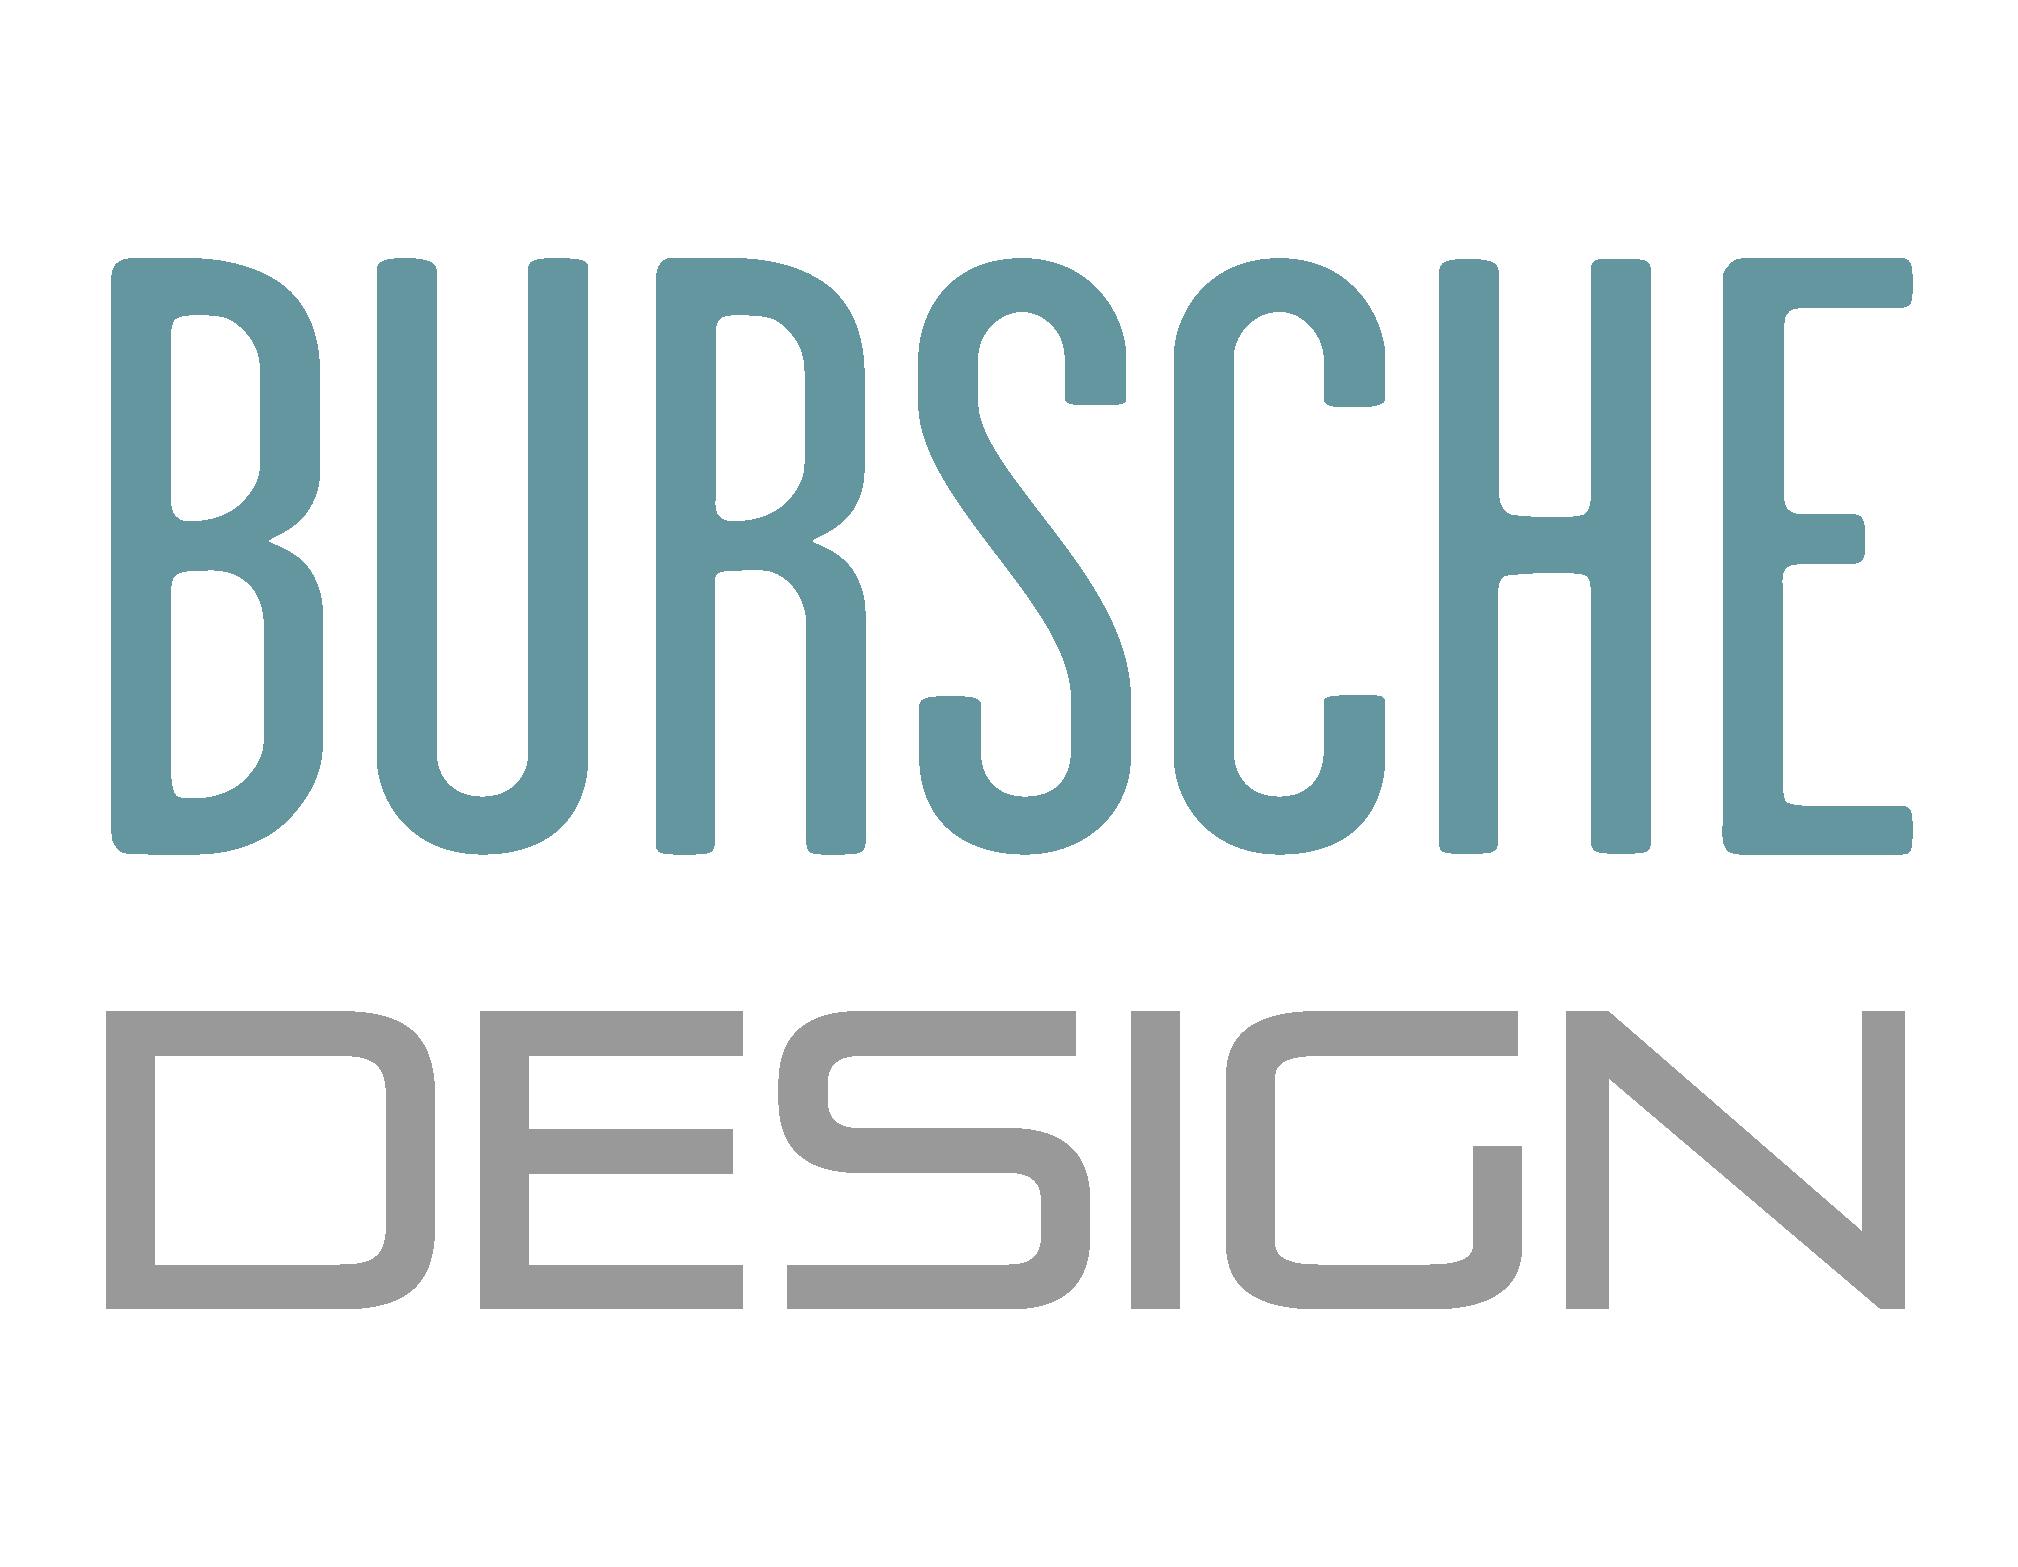 Bursche-Design